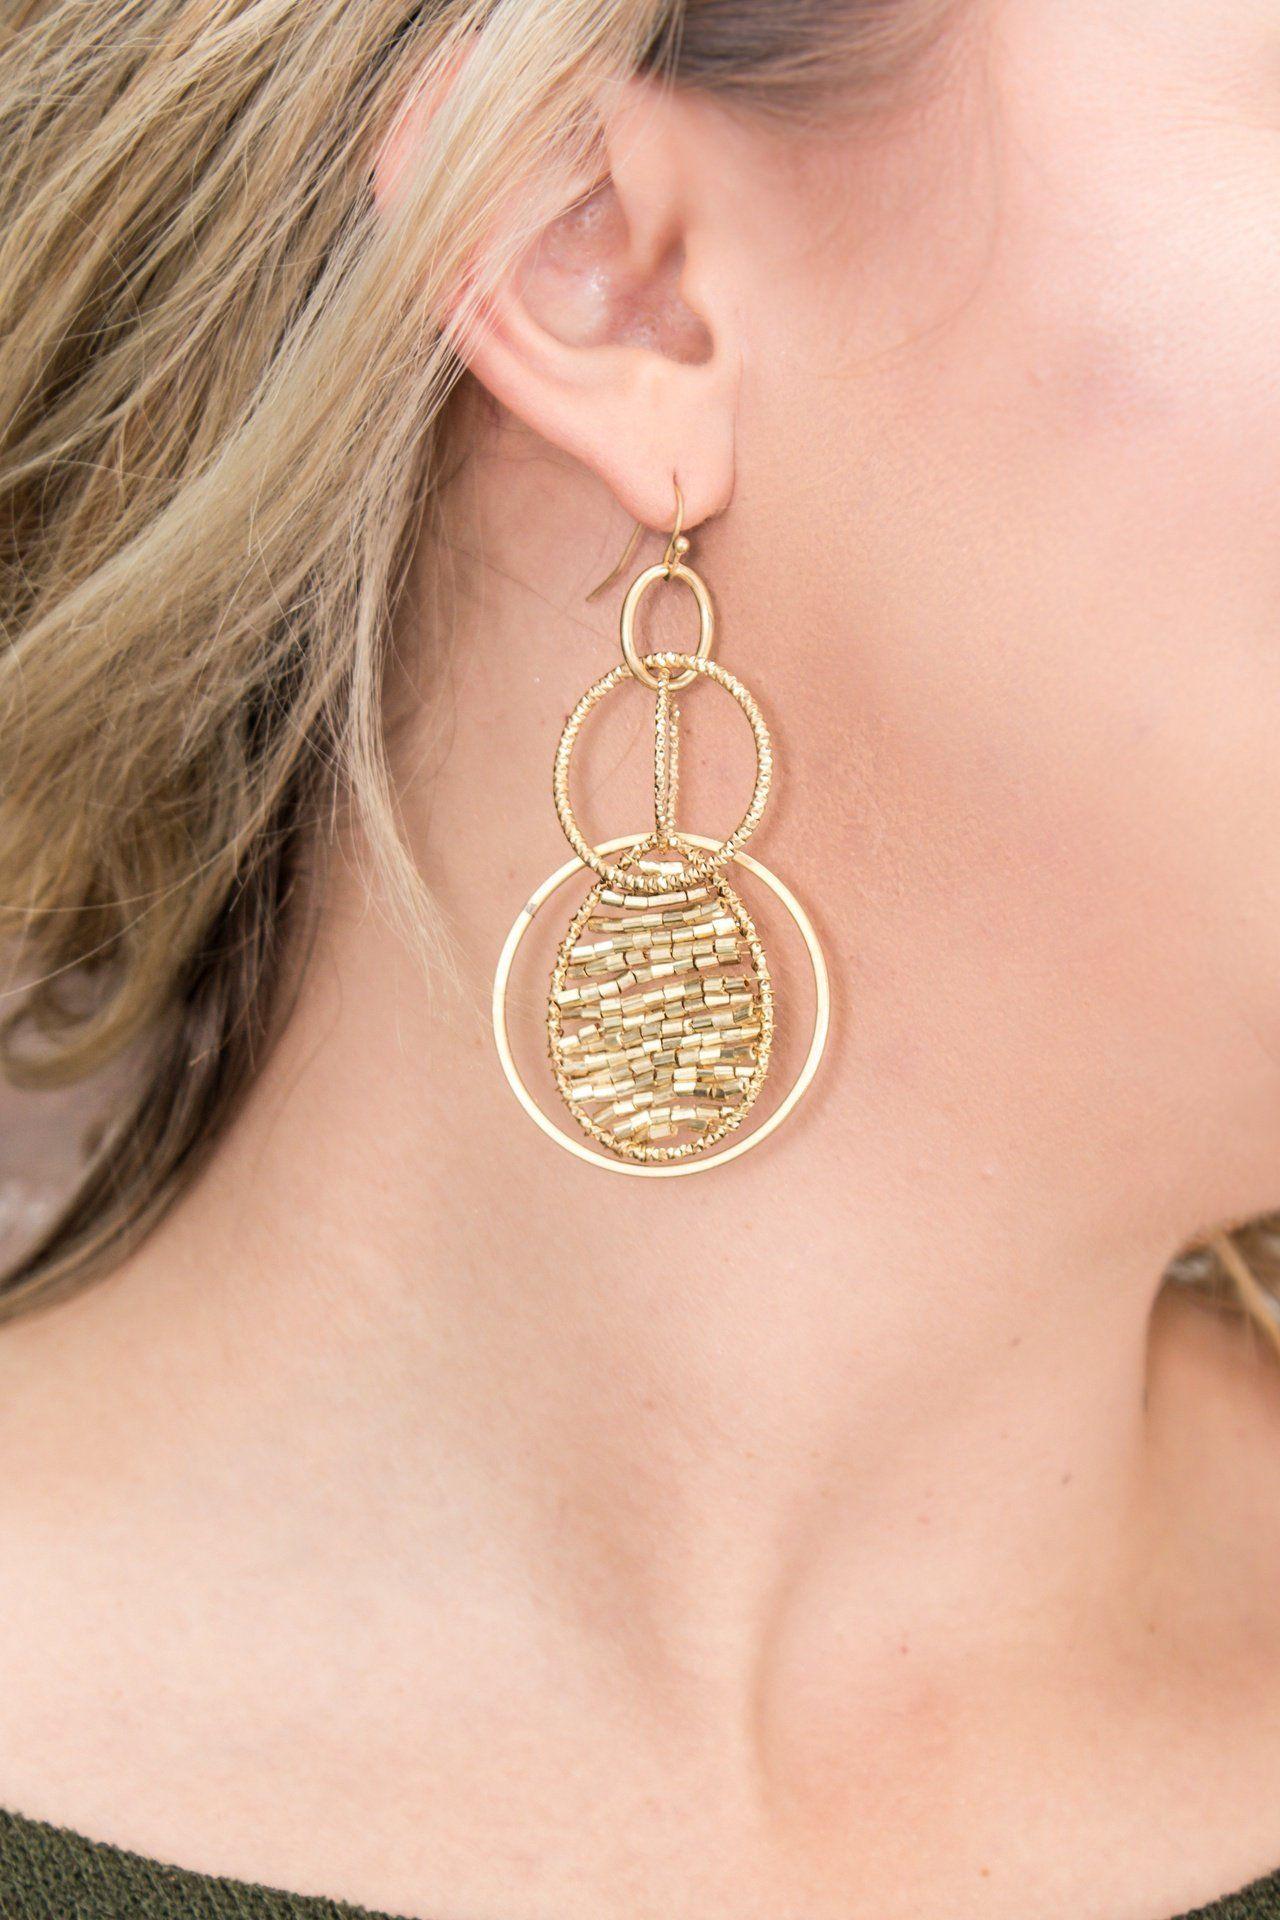 Starling Earrings